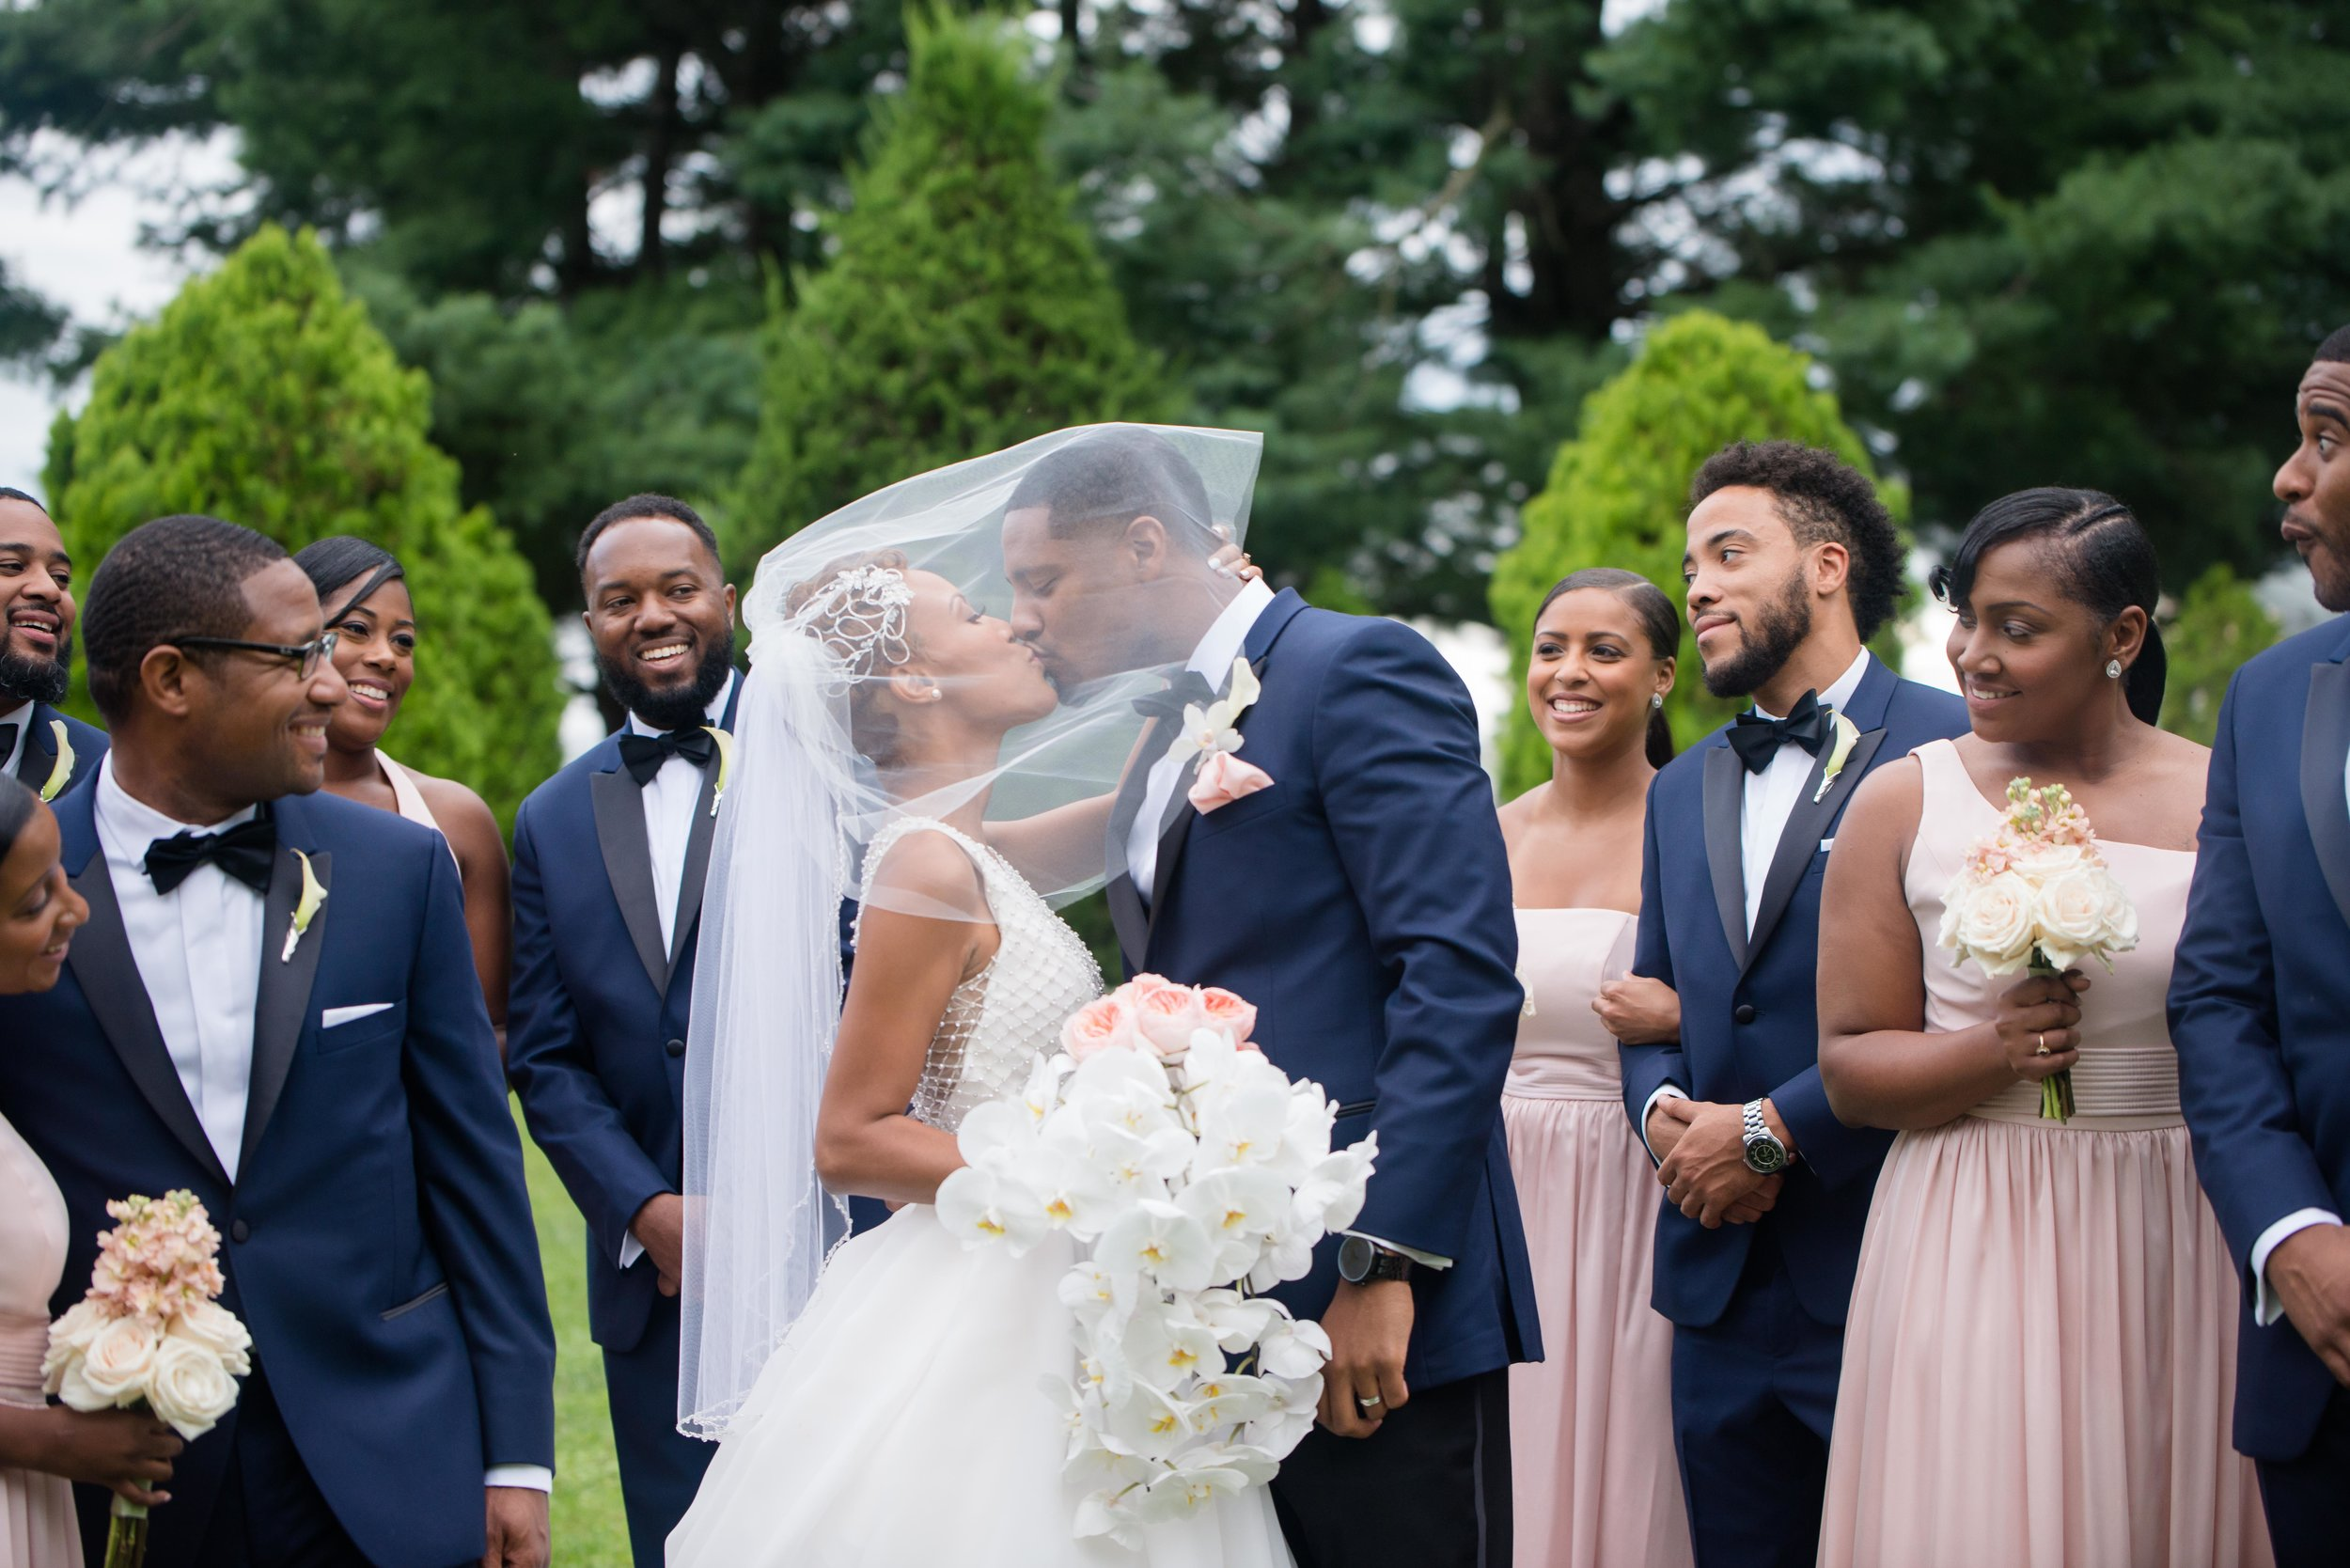 Chase Wedding - 2017-73.JPG